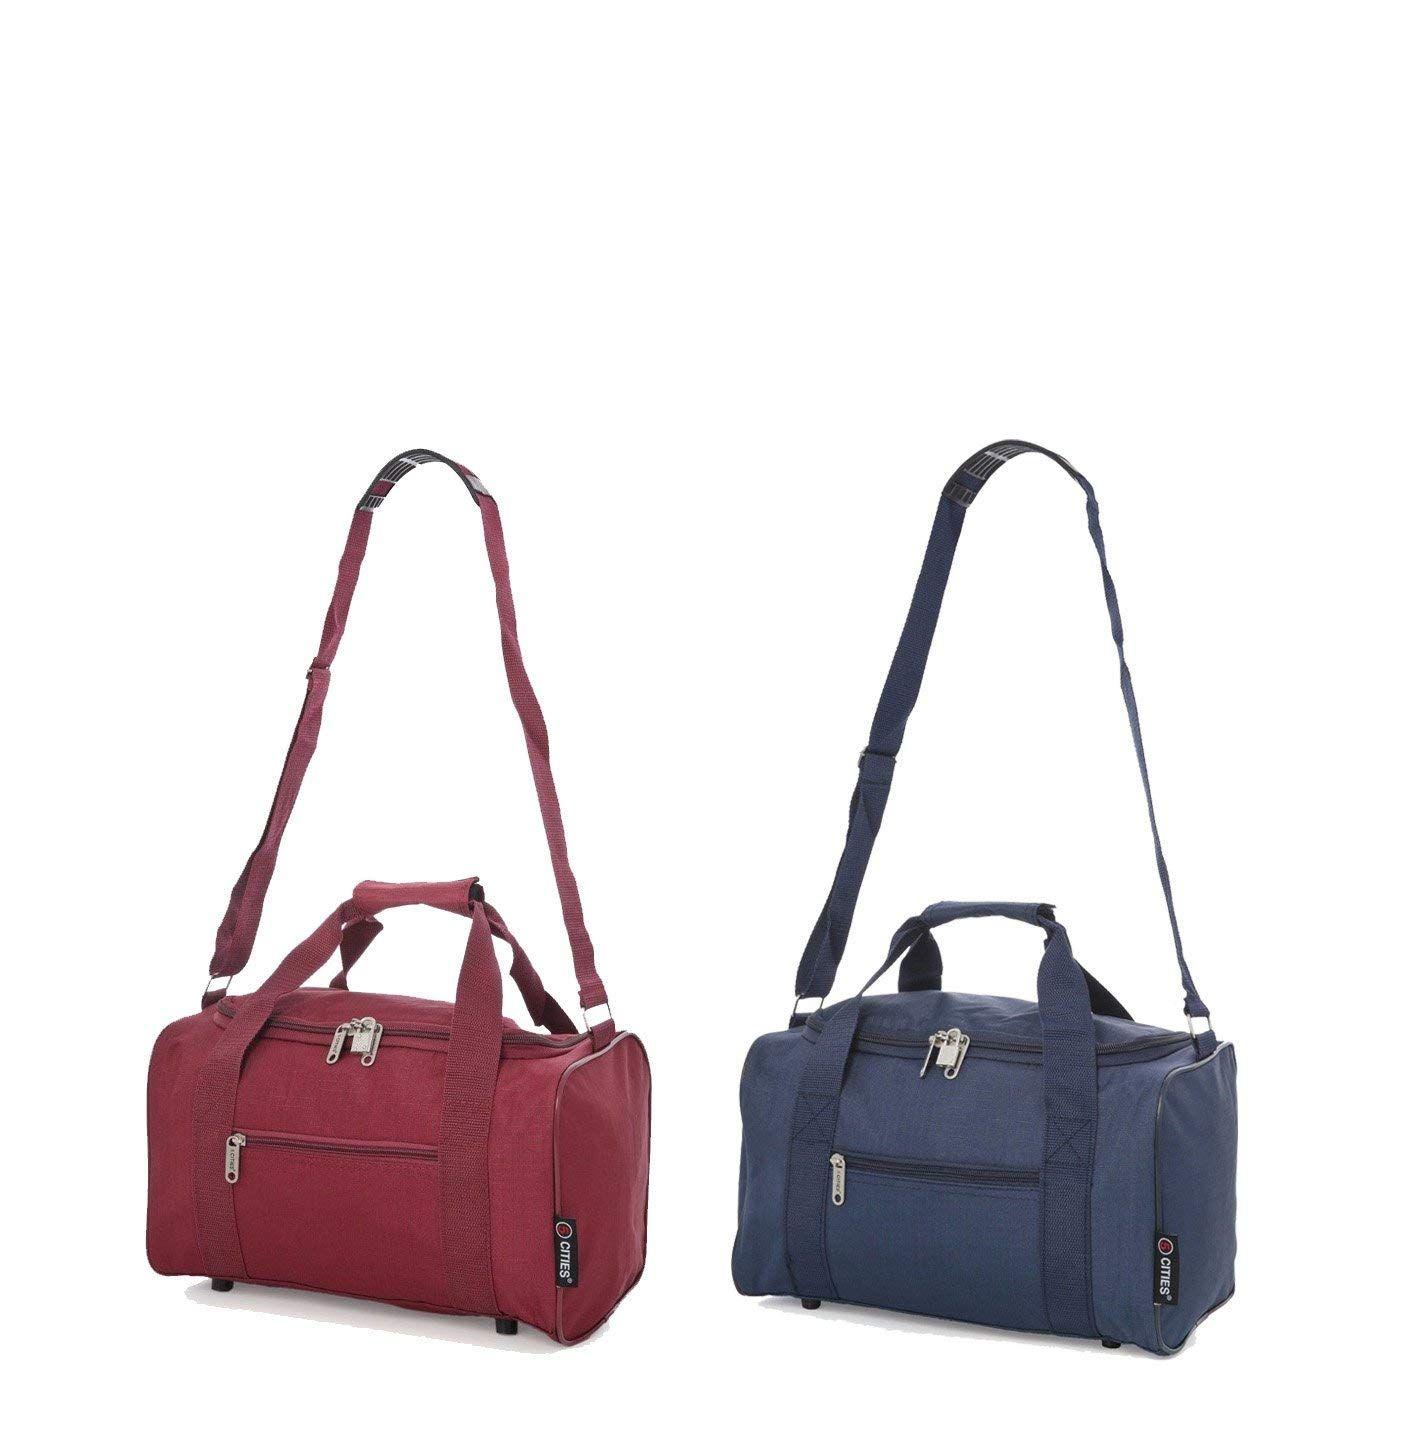 89ac2f43b 5 Cities Maximum 35x20x20 Ryanair Cabin Hand Luggage Holdall Flight Bag,  Set of 2: Amazon.co.uk: Luggage